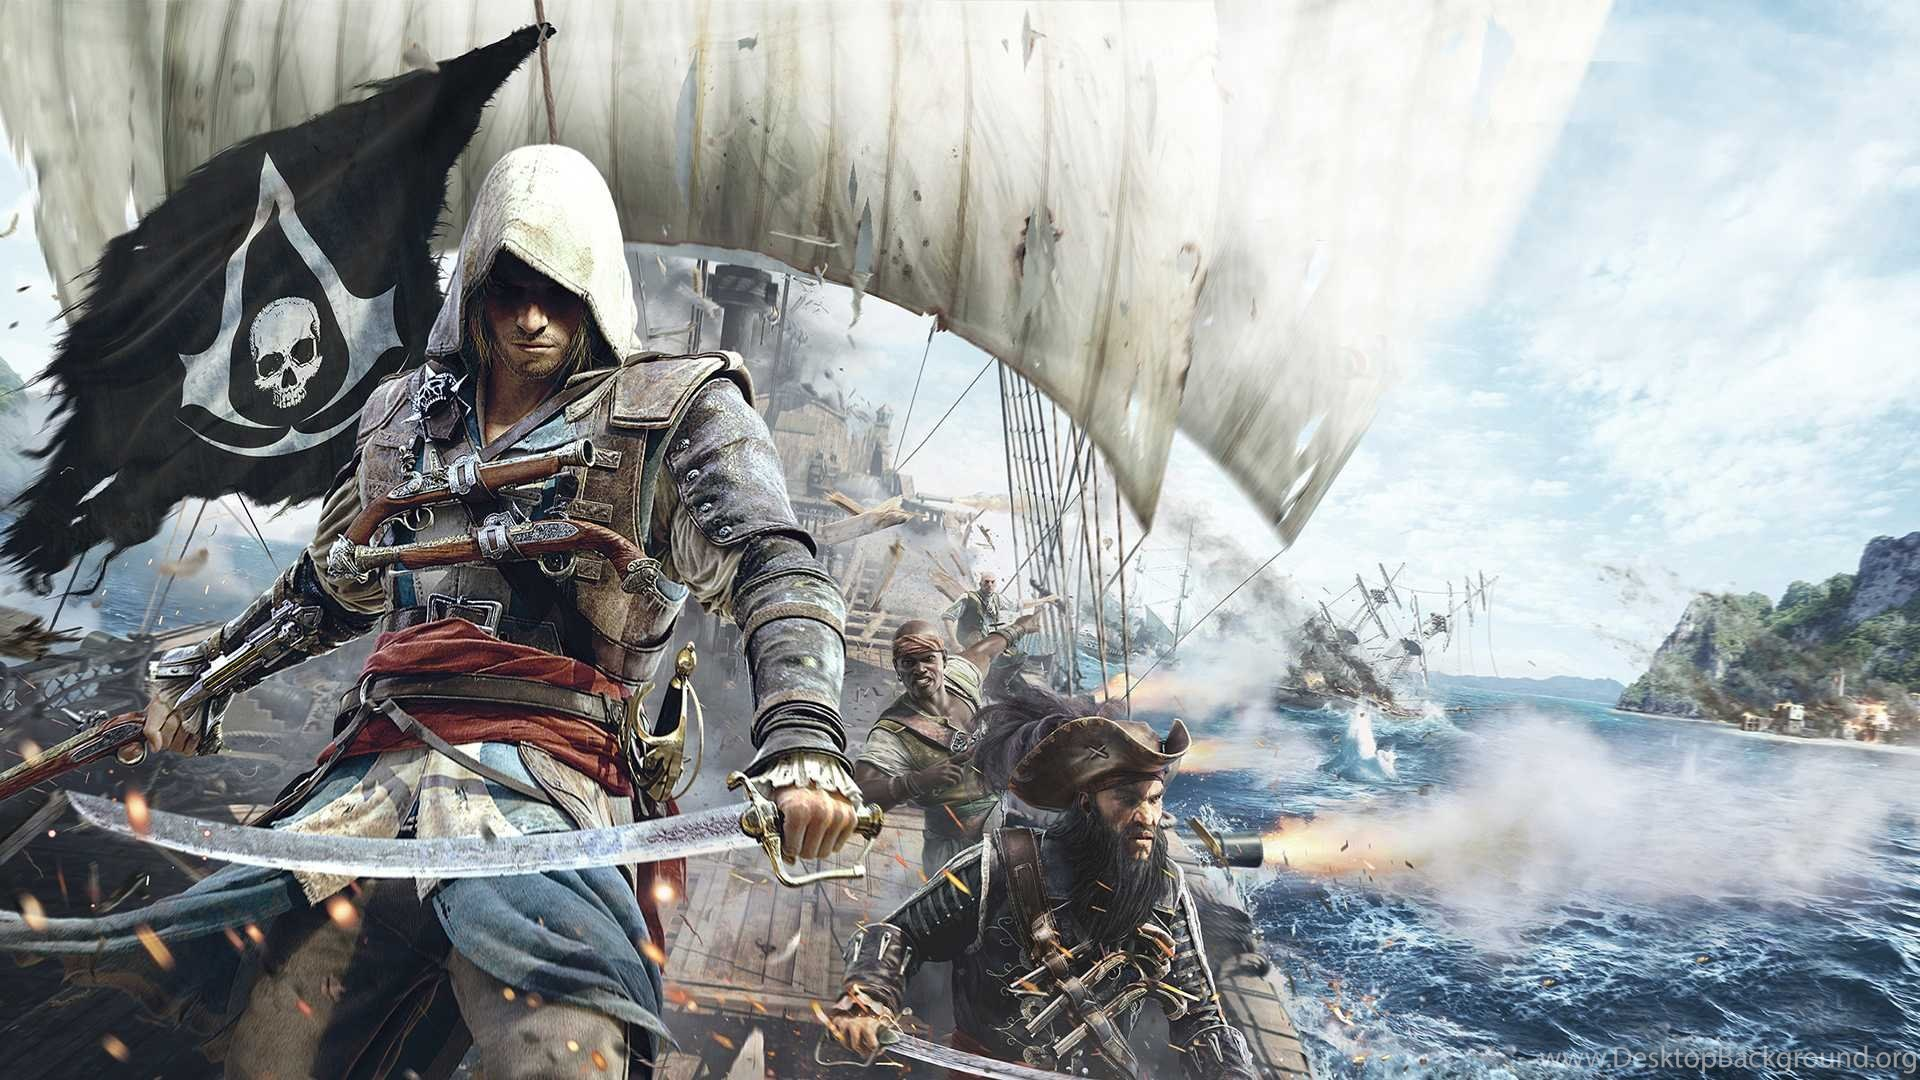 Assassins Creed Black Flag Wallpaper Walleo Co Desktop Background